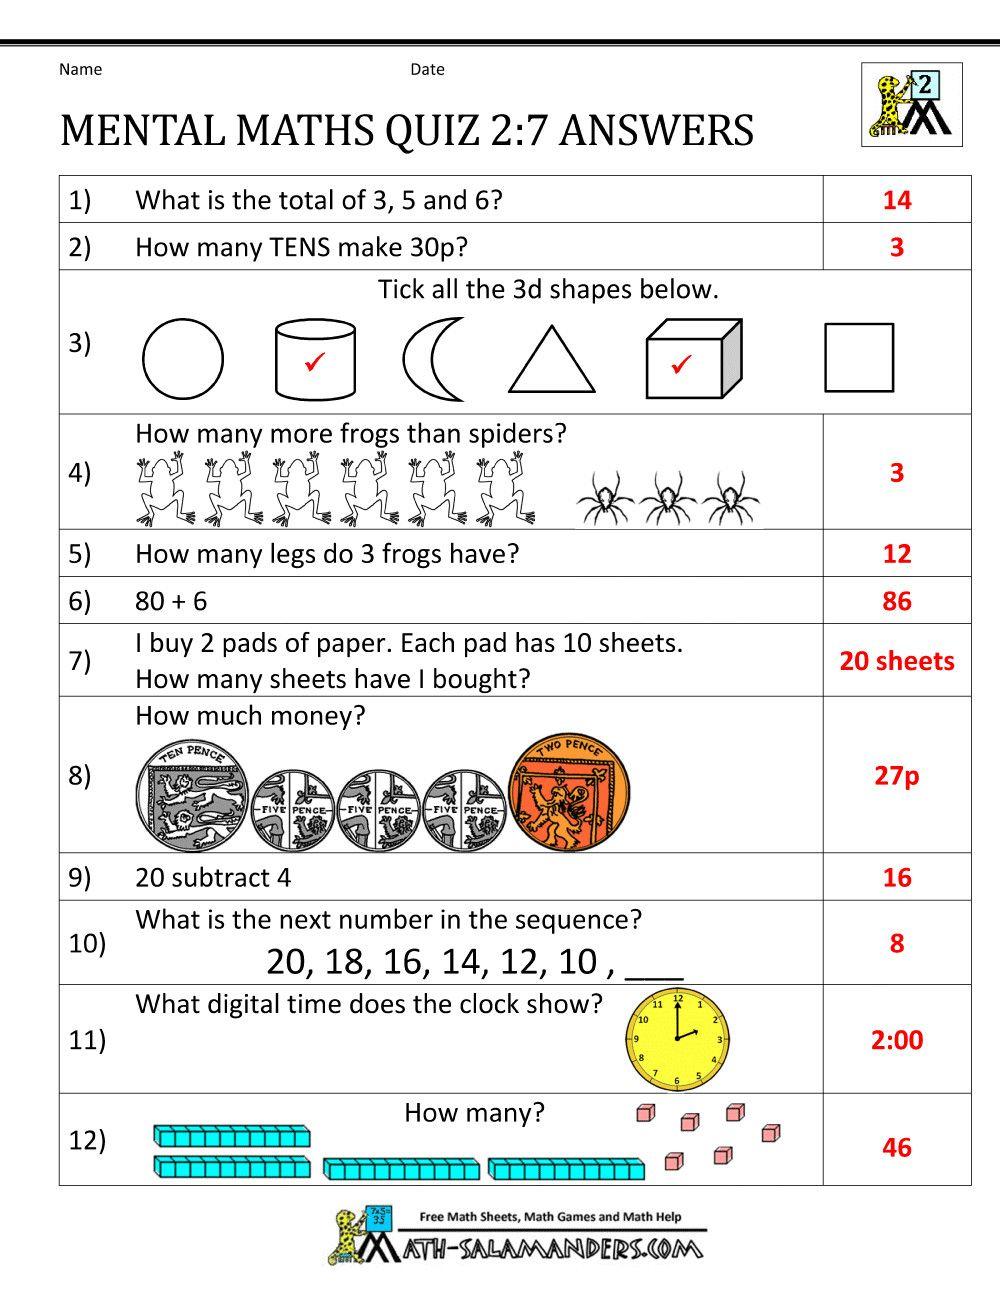 3 Mental Maths Questions For Class 7 2 Year 7 Maths Worksheets Printable 1st Grade Math In 2020 Mental Maths Worksheets Year 7 Maths Worksheets Math Worksheets